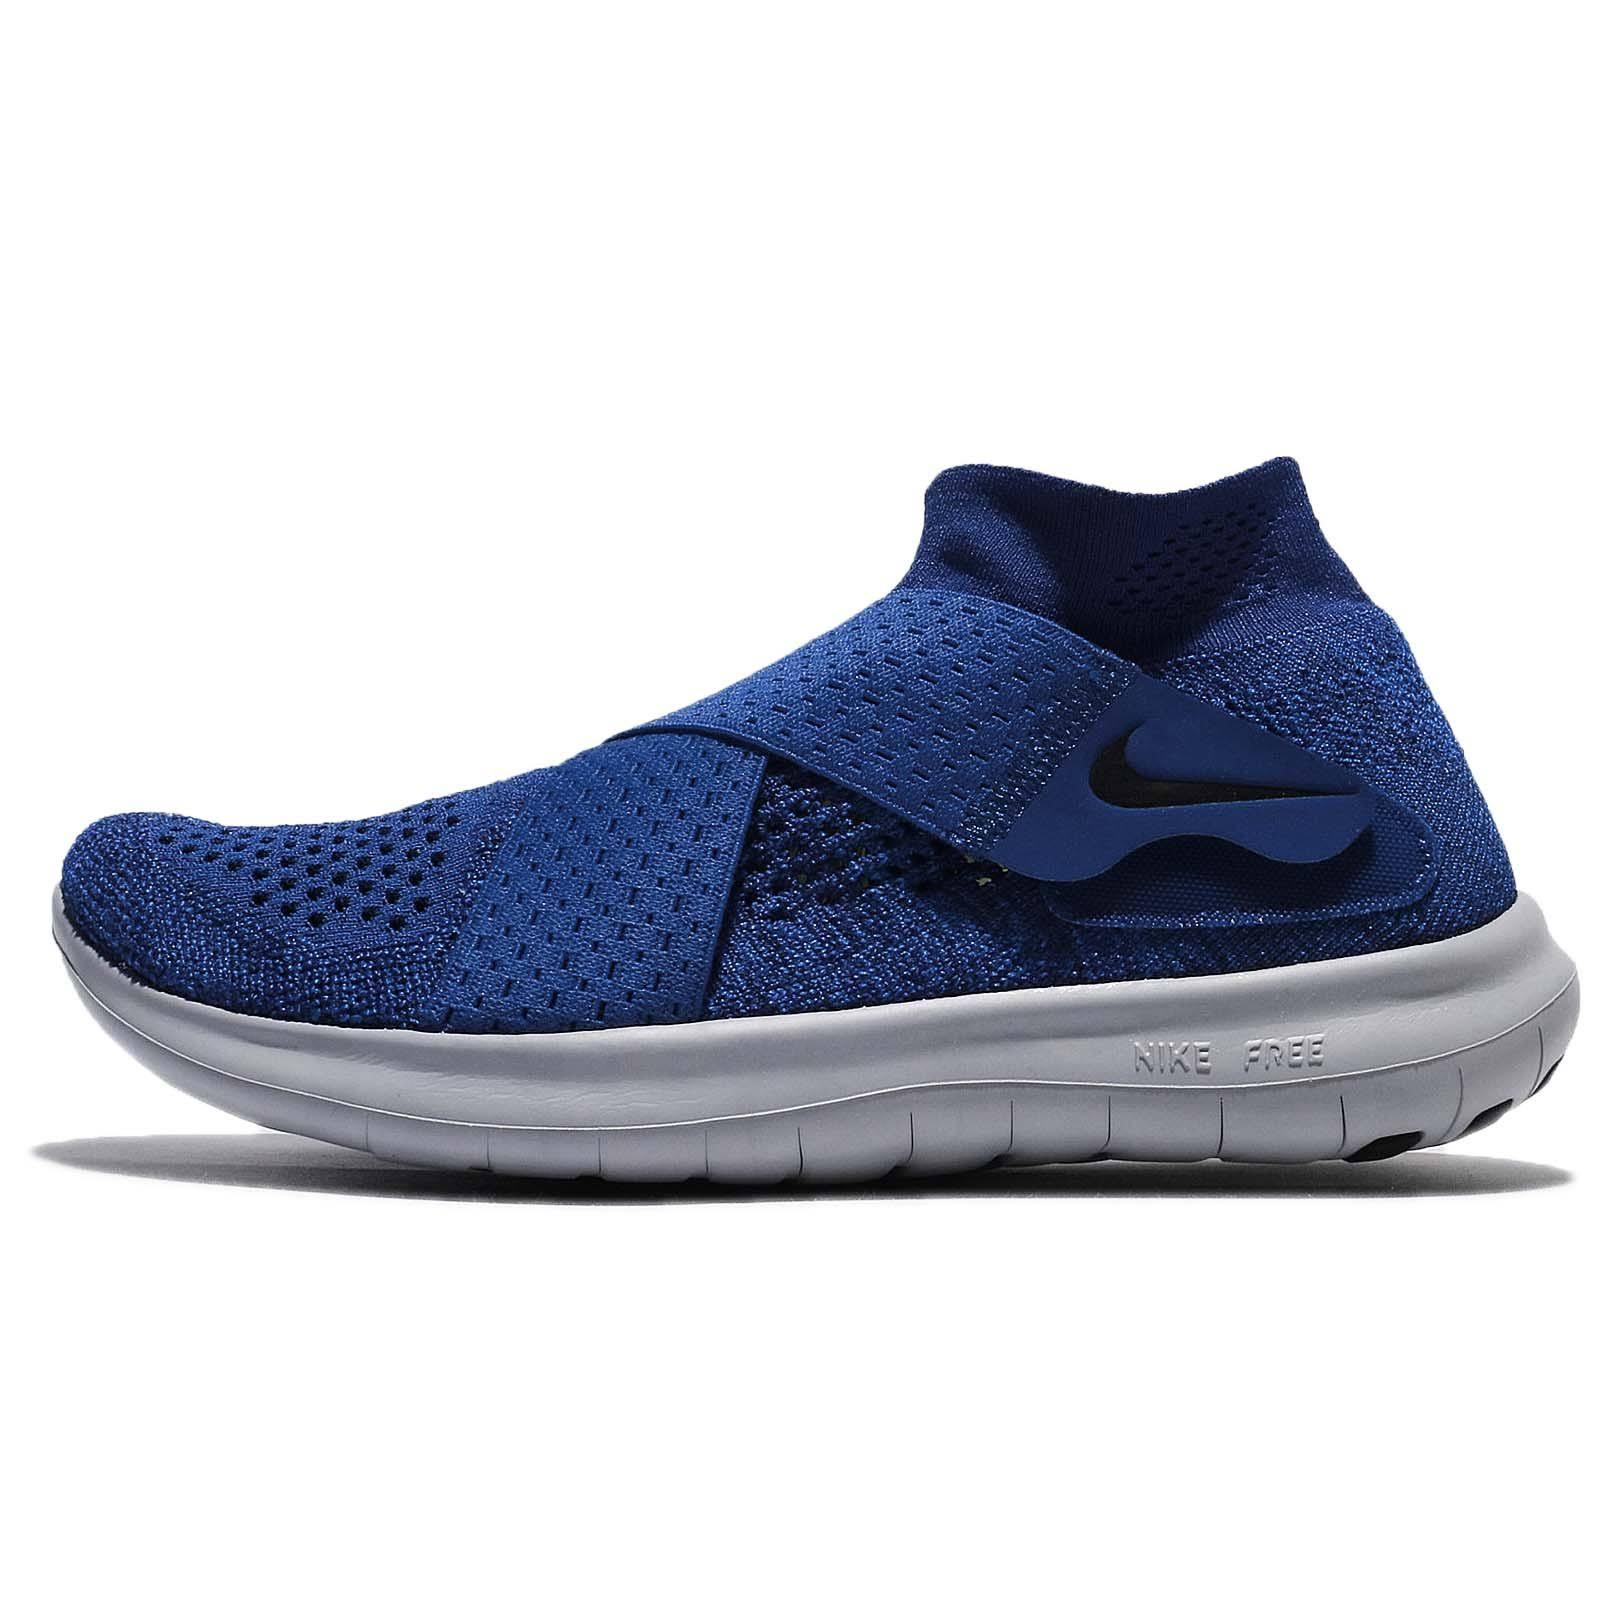 De Negro Rn Mujer Zapatillas 2017 Para Fk Tamaño Running Nike Motion Free 9b ZdqA76qw